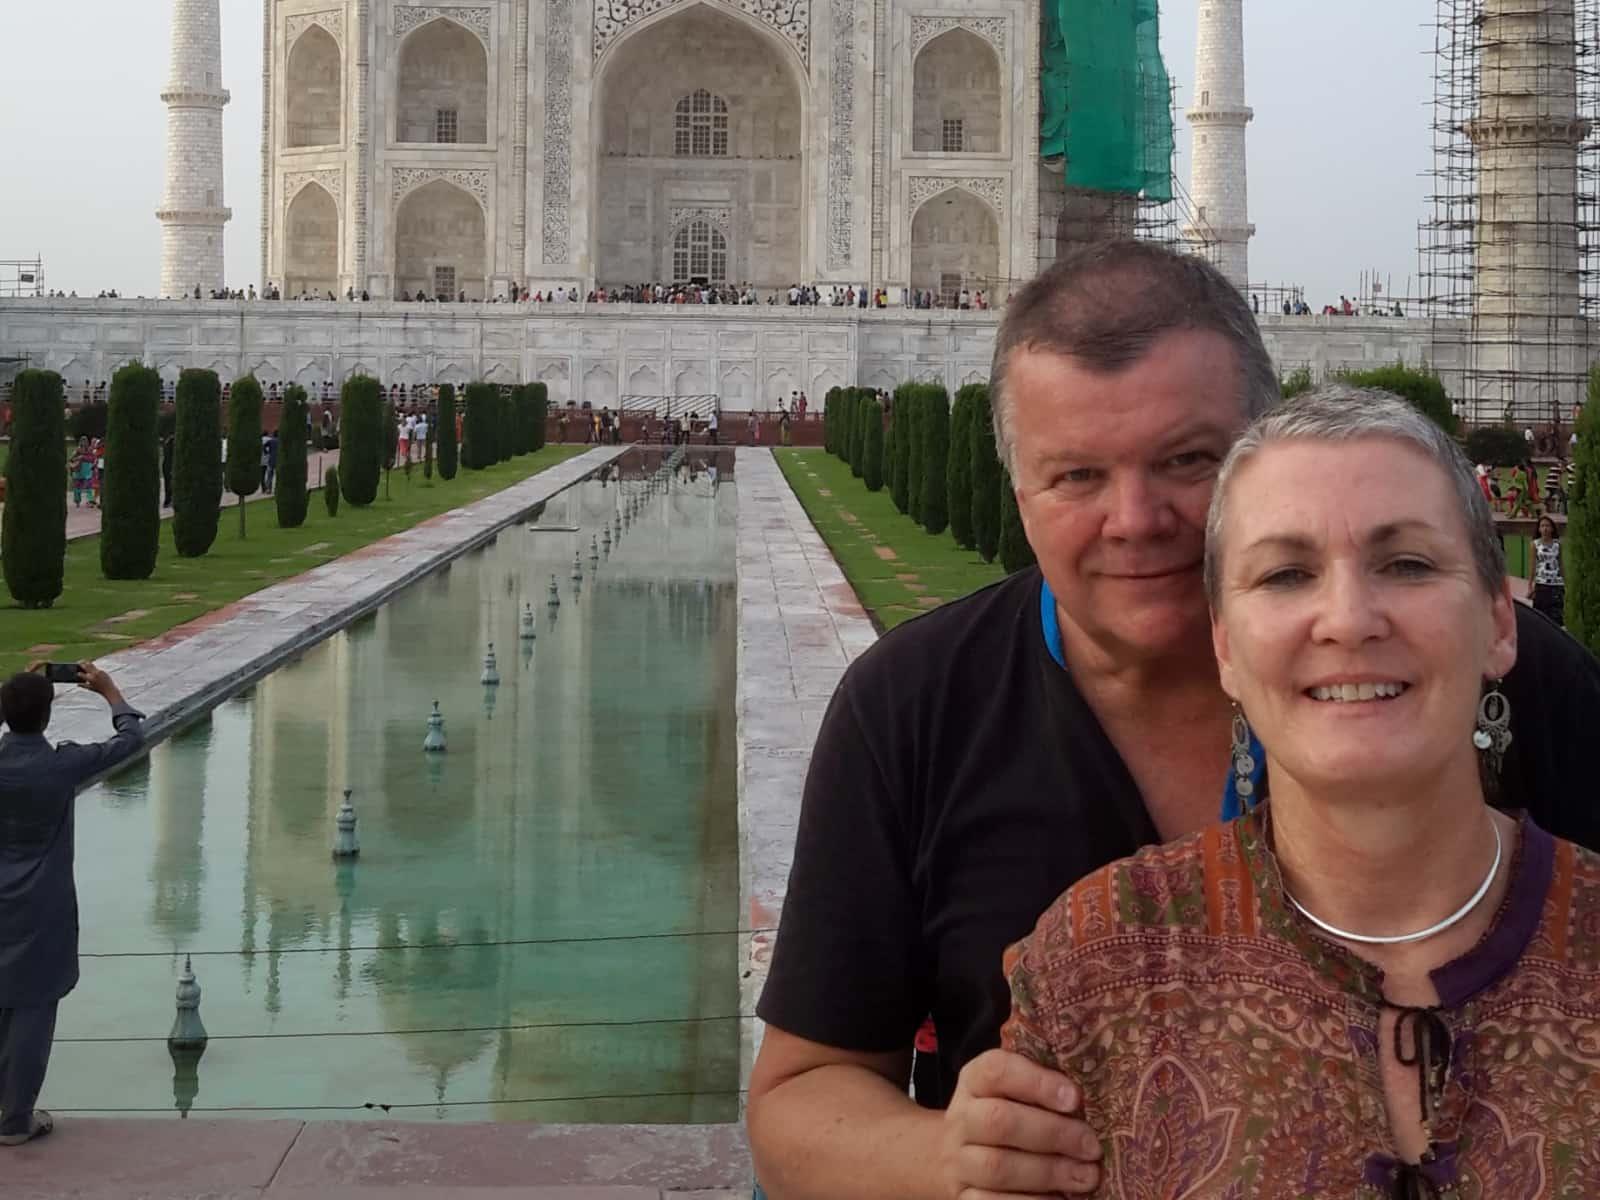 Dianne & Steve from Ibiza, Spain